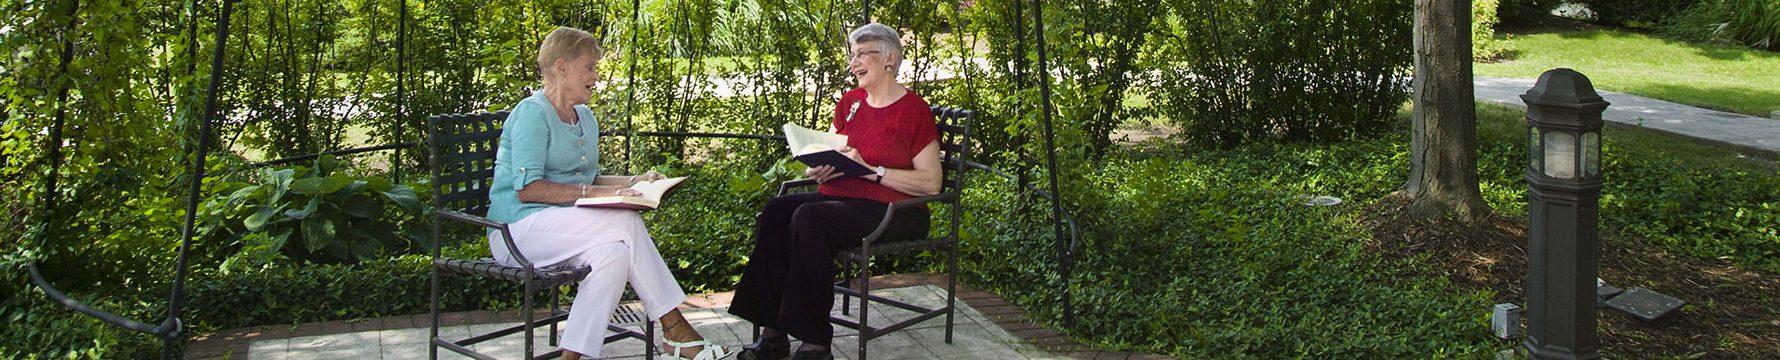 Two senior women sitting in the garden of their senior living community and reading books